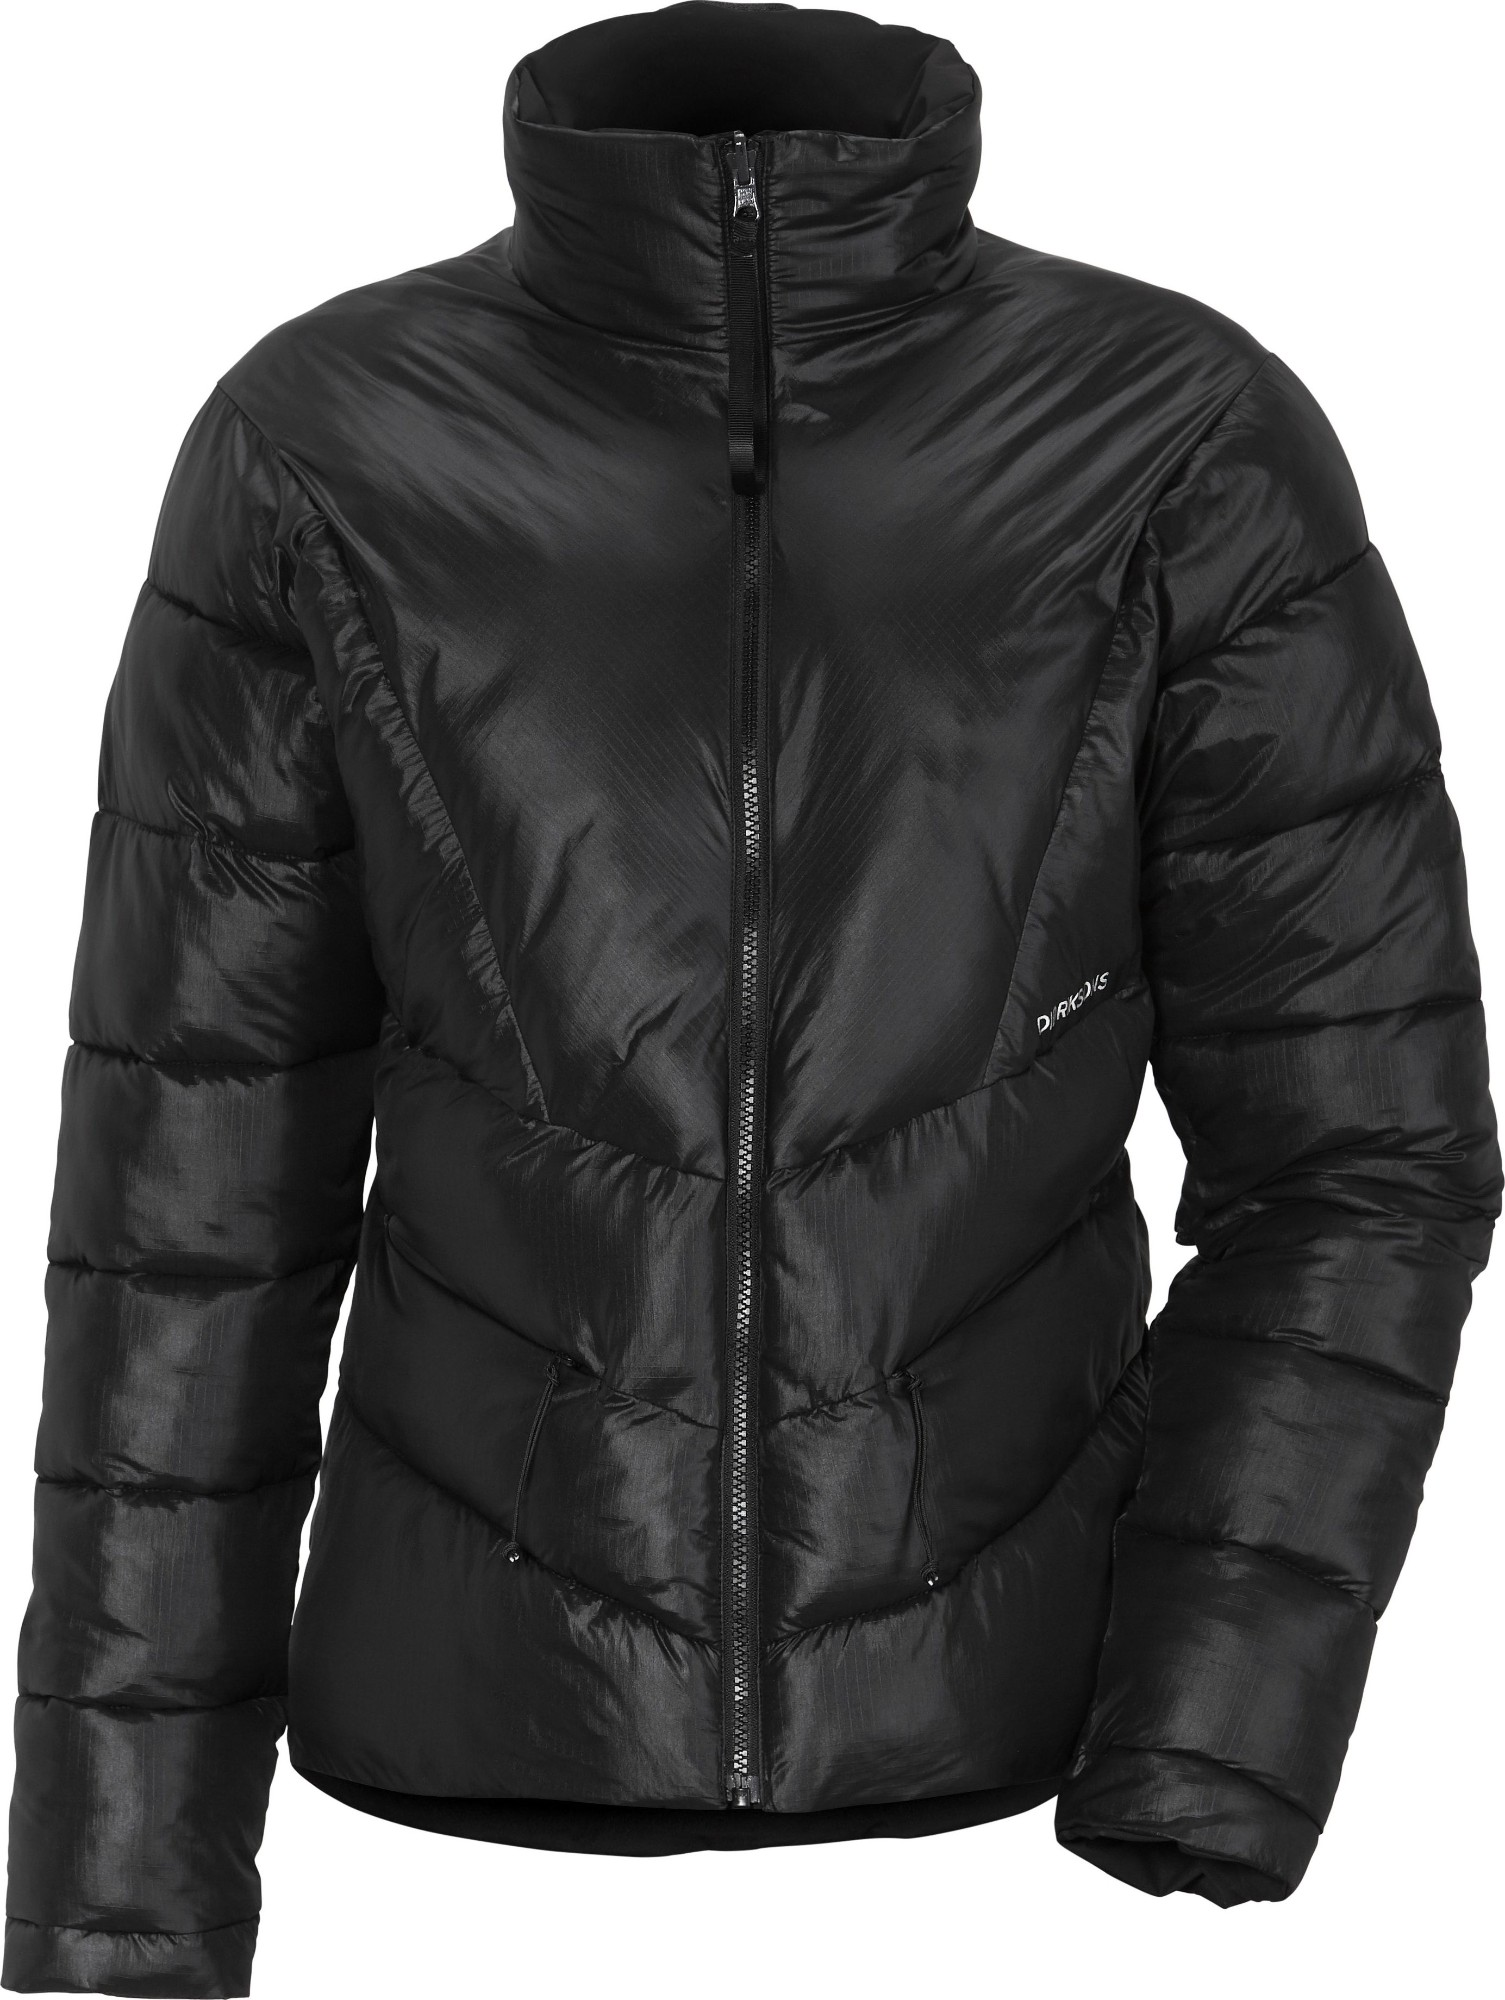 DIDRIKSONS Anni Women's Jacket Black EU36/38